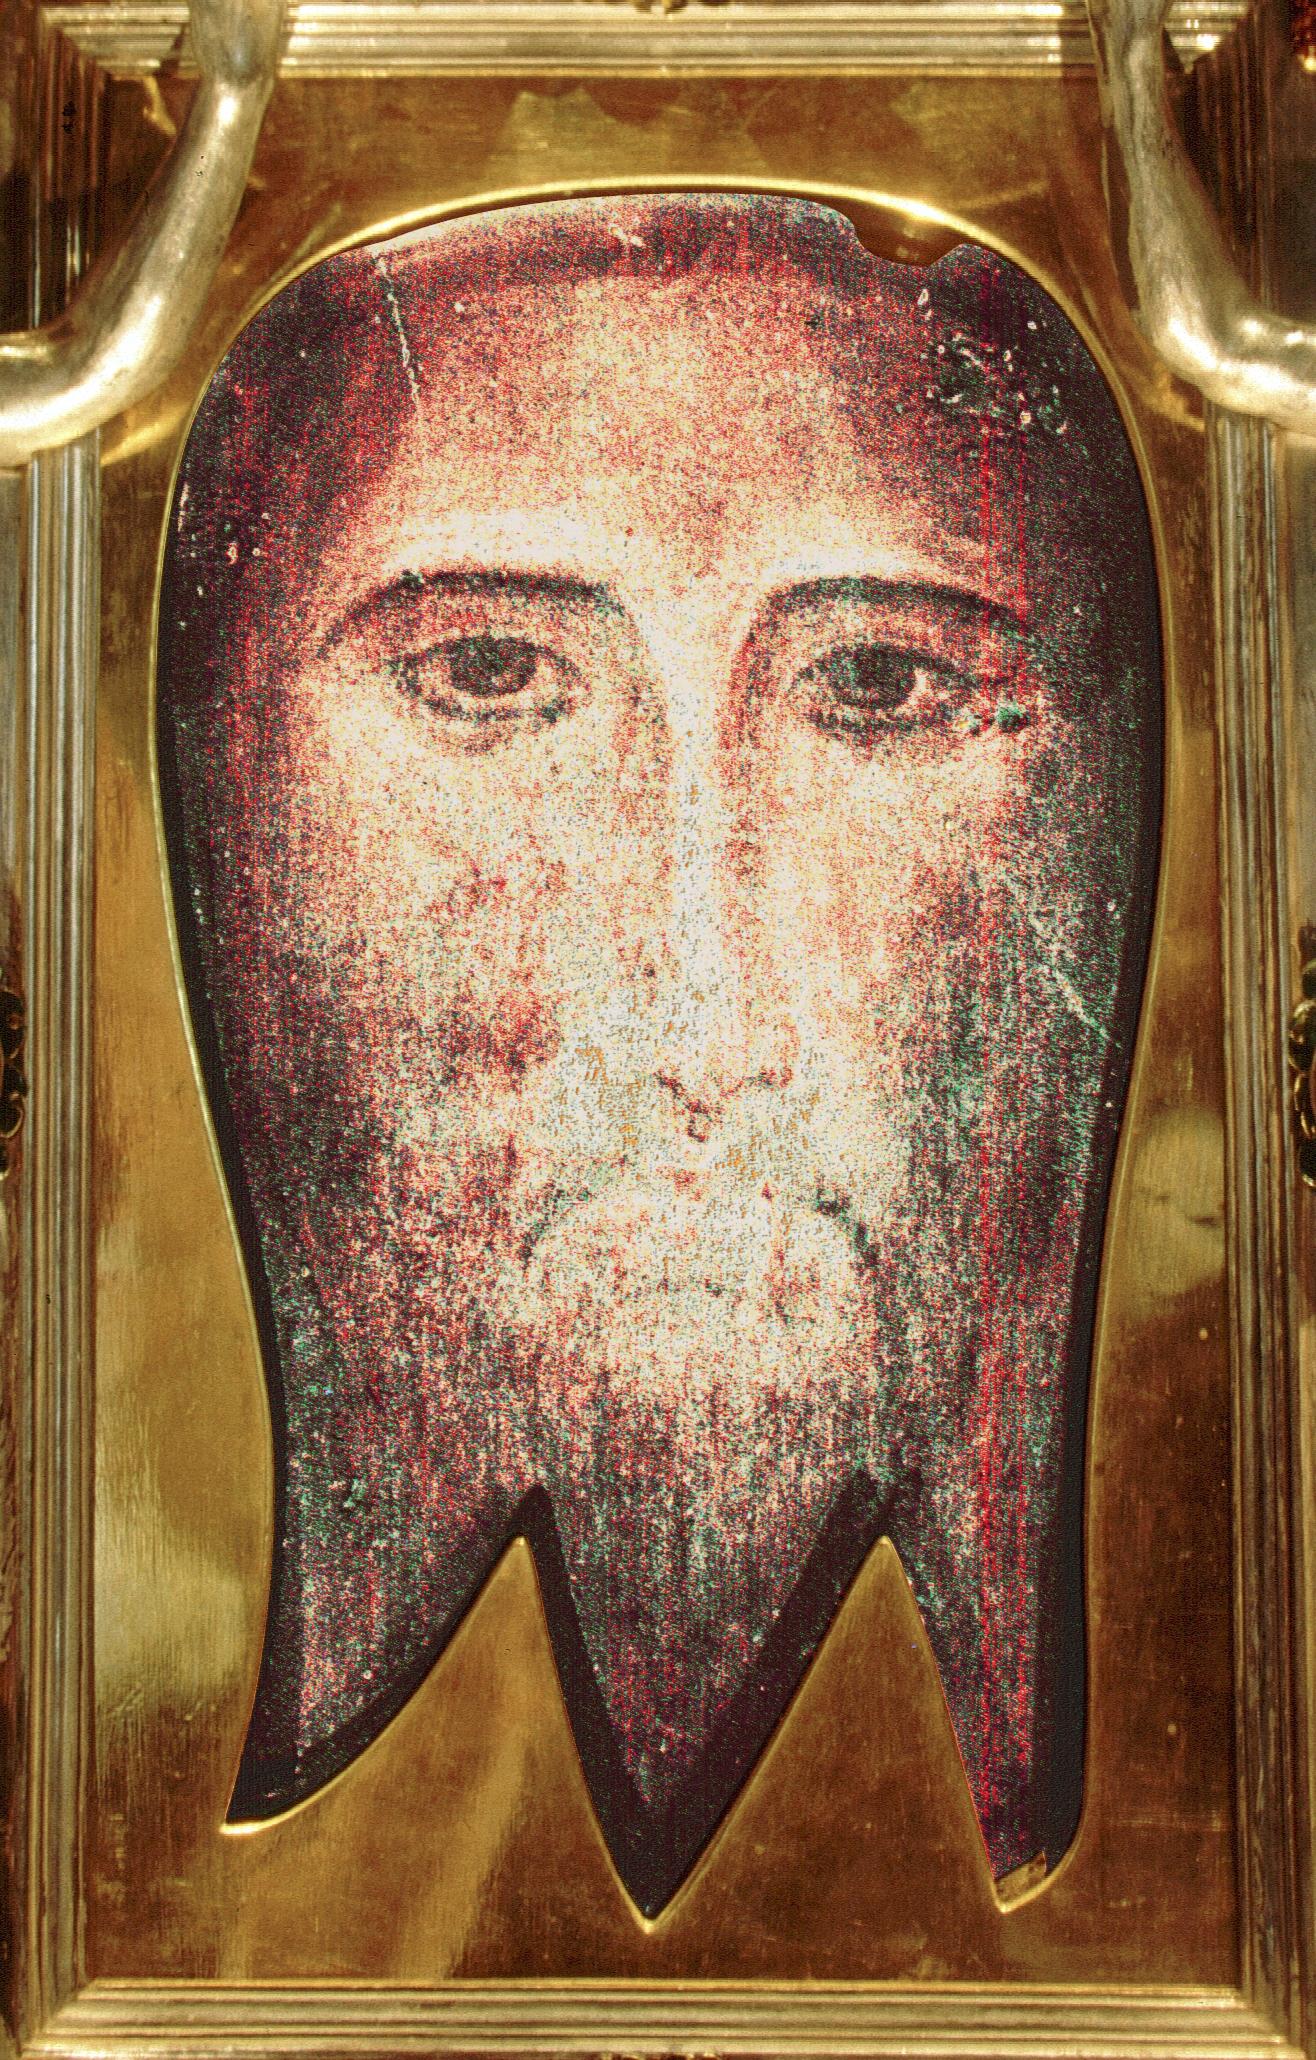 The_San_Silvestro-image-imprint-of-Jesus-non-hand-made-Mandylion_visage